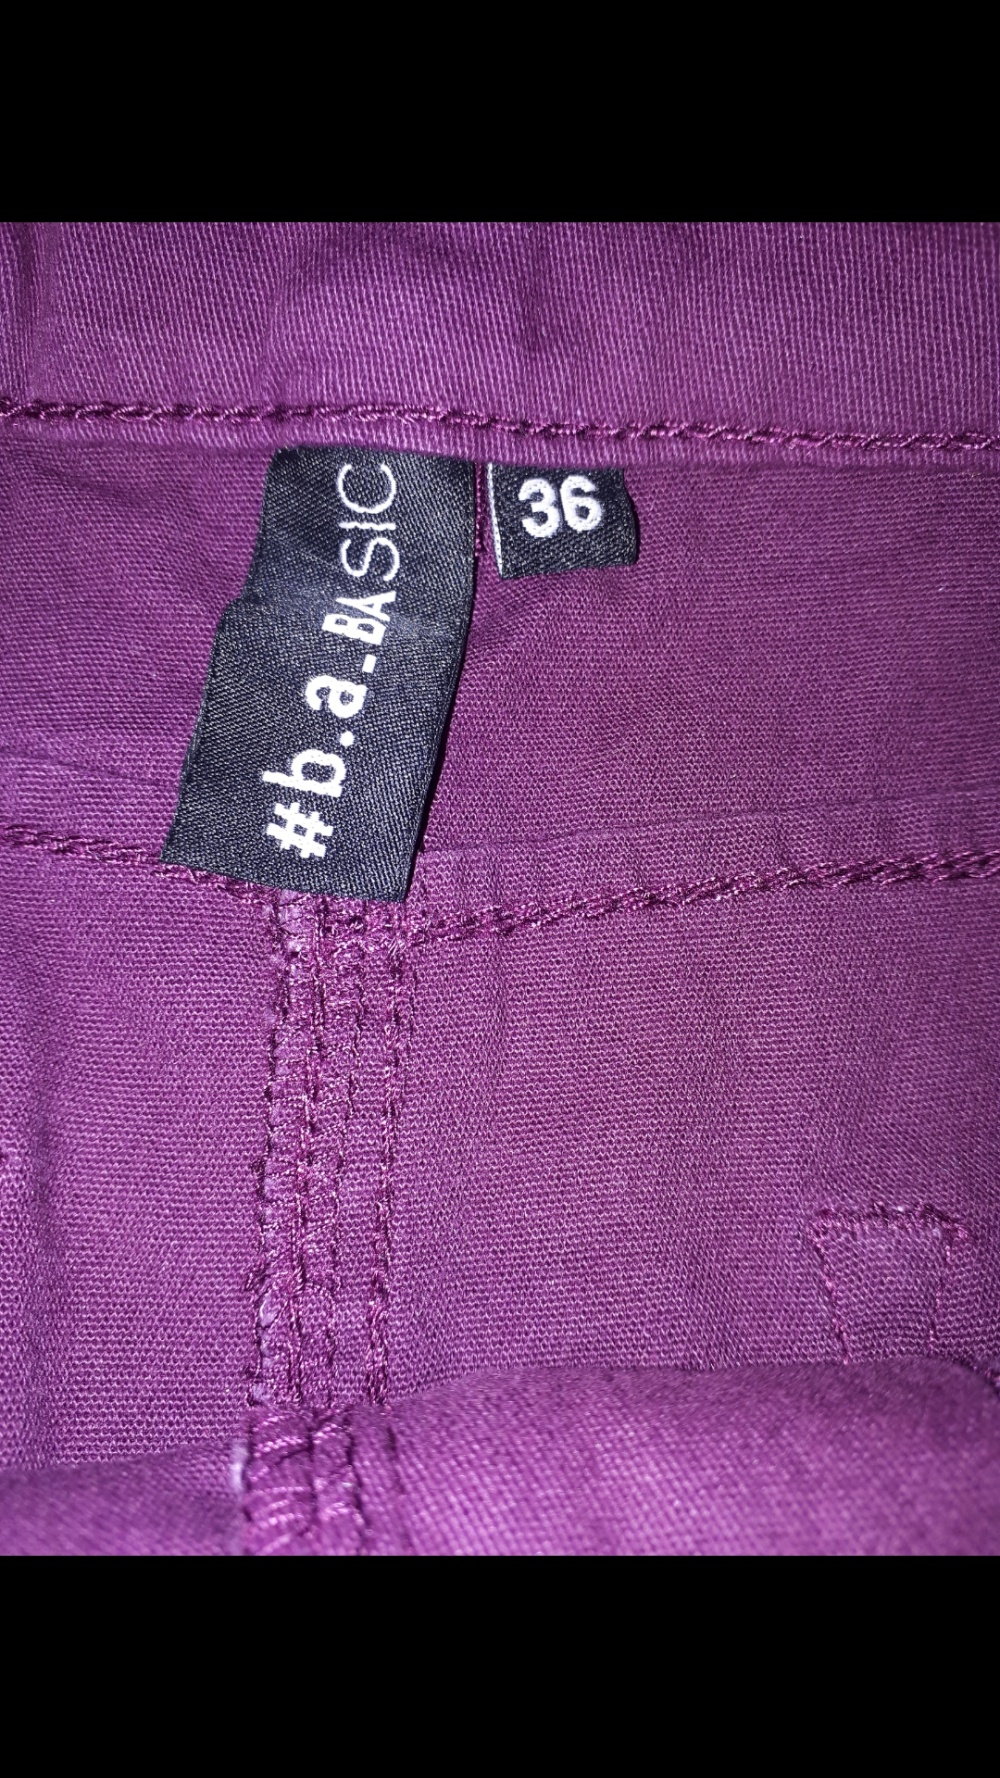 Юбка Zara basic 36 евро р-р